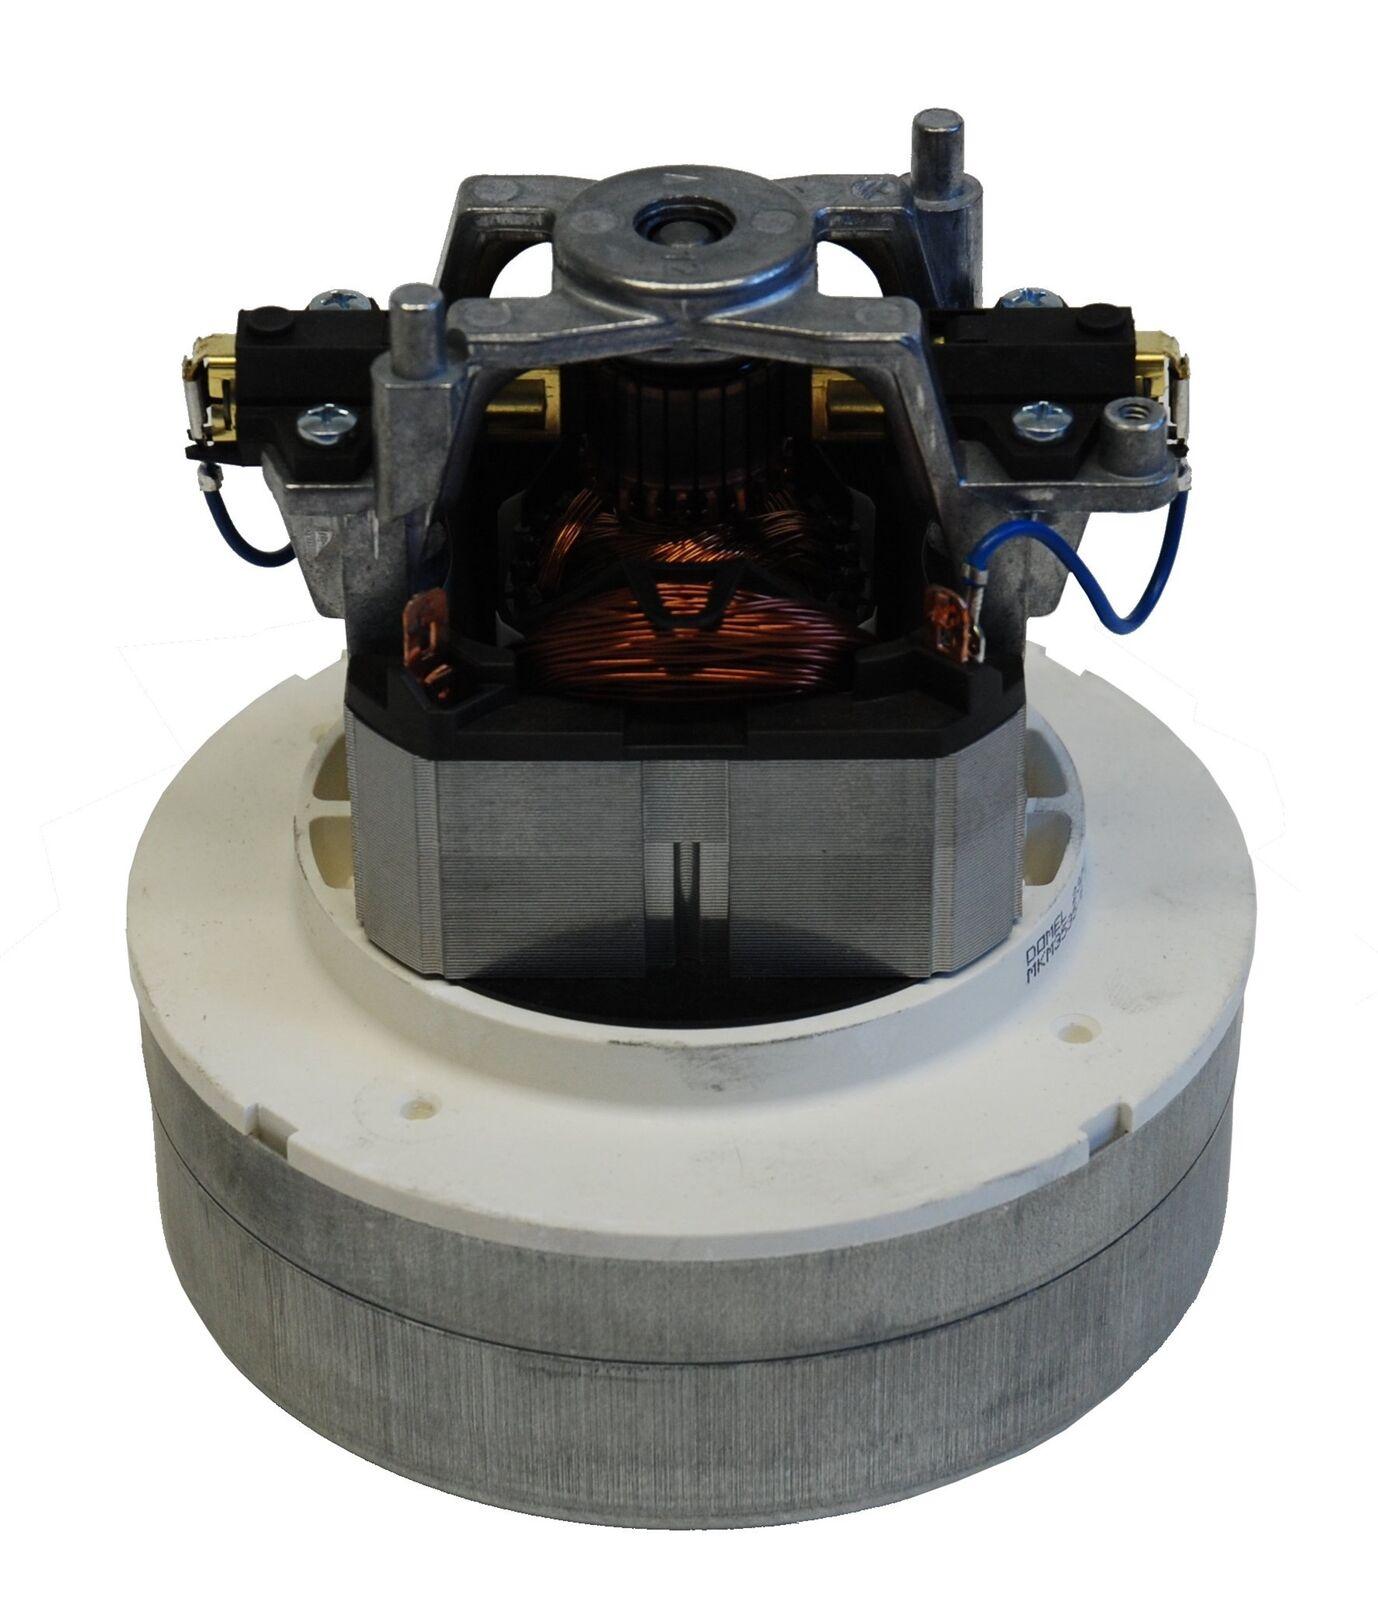 Saugturbine Saugmotor für Sorma 510 Motor